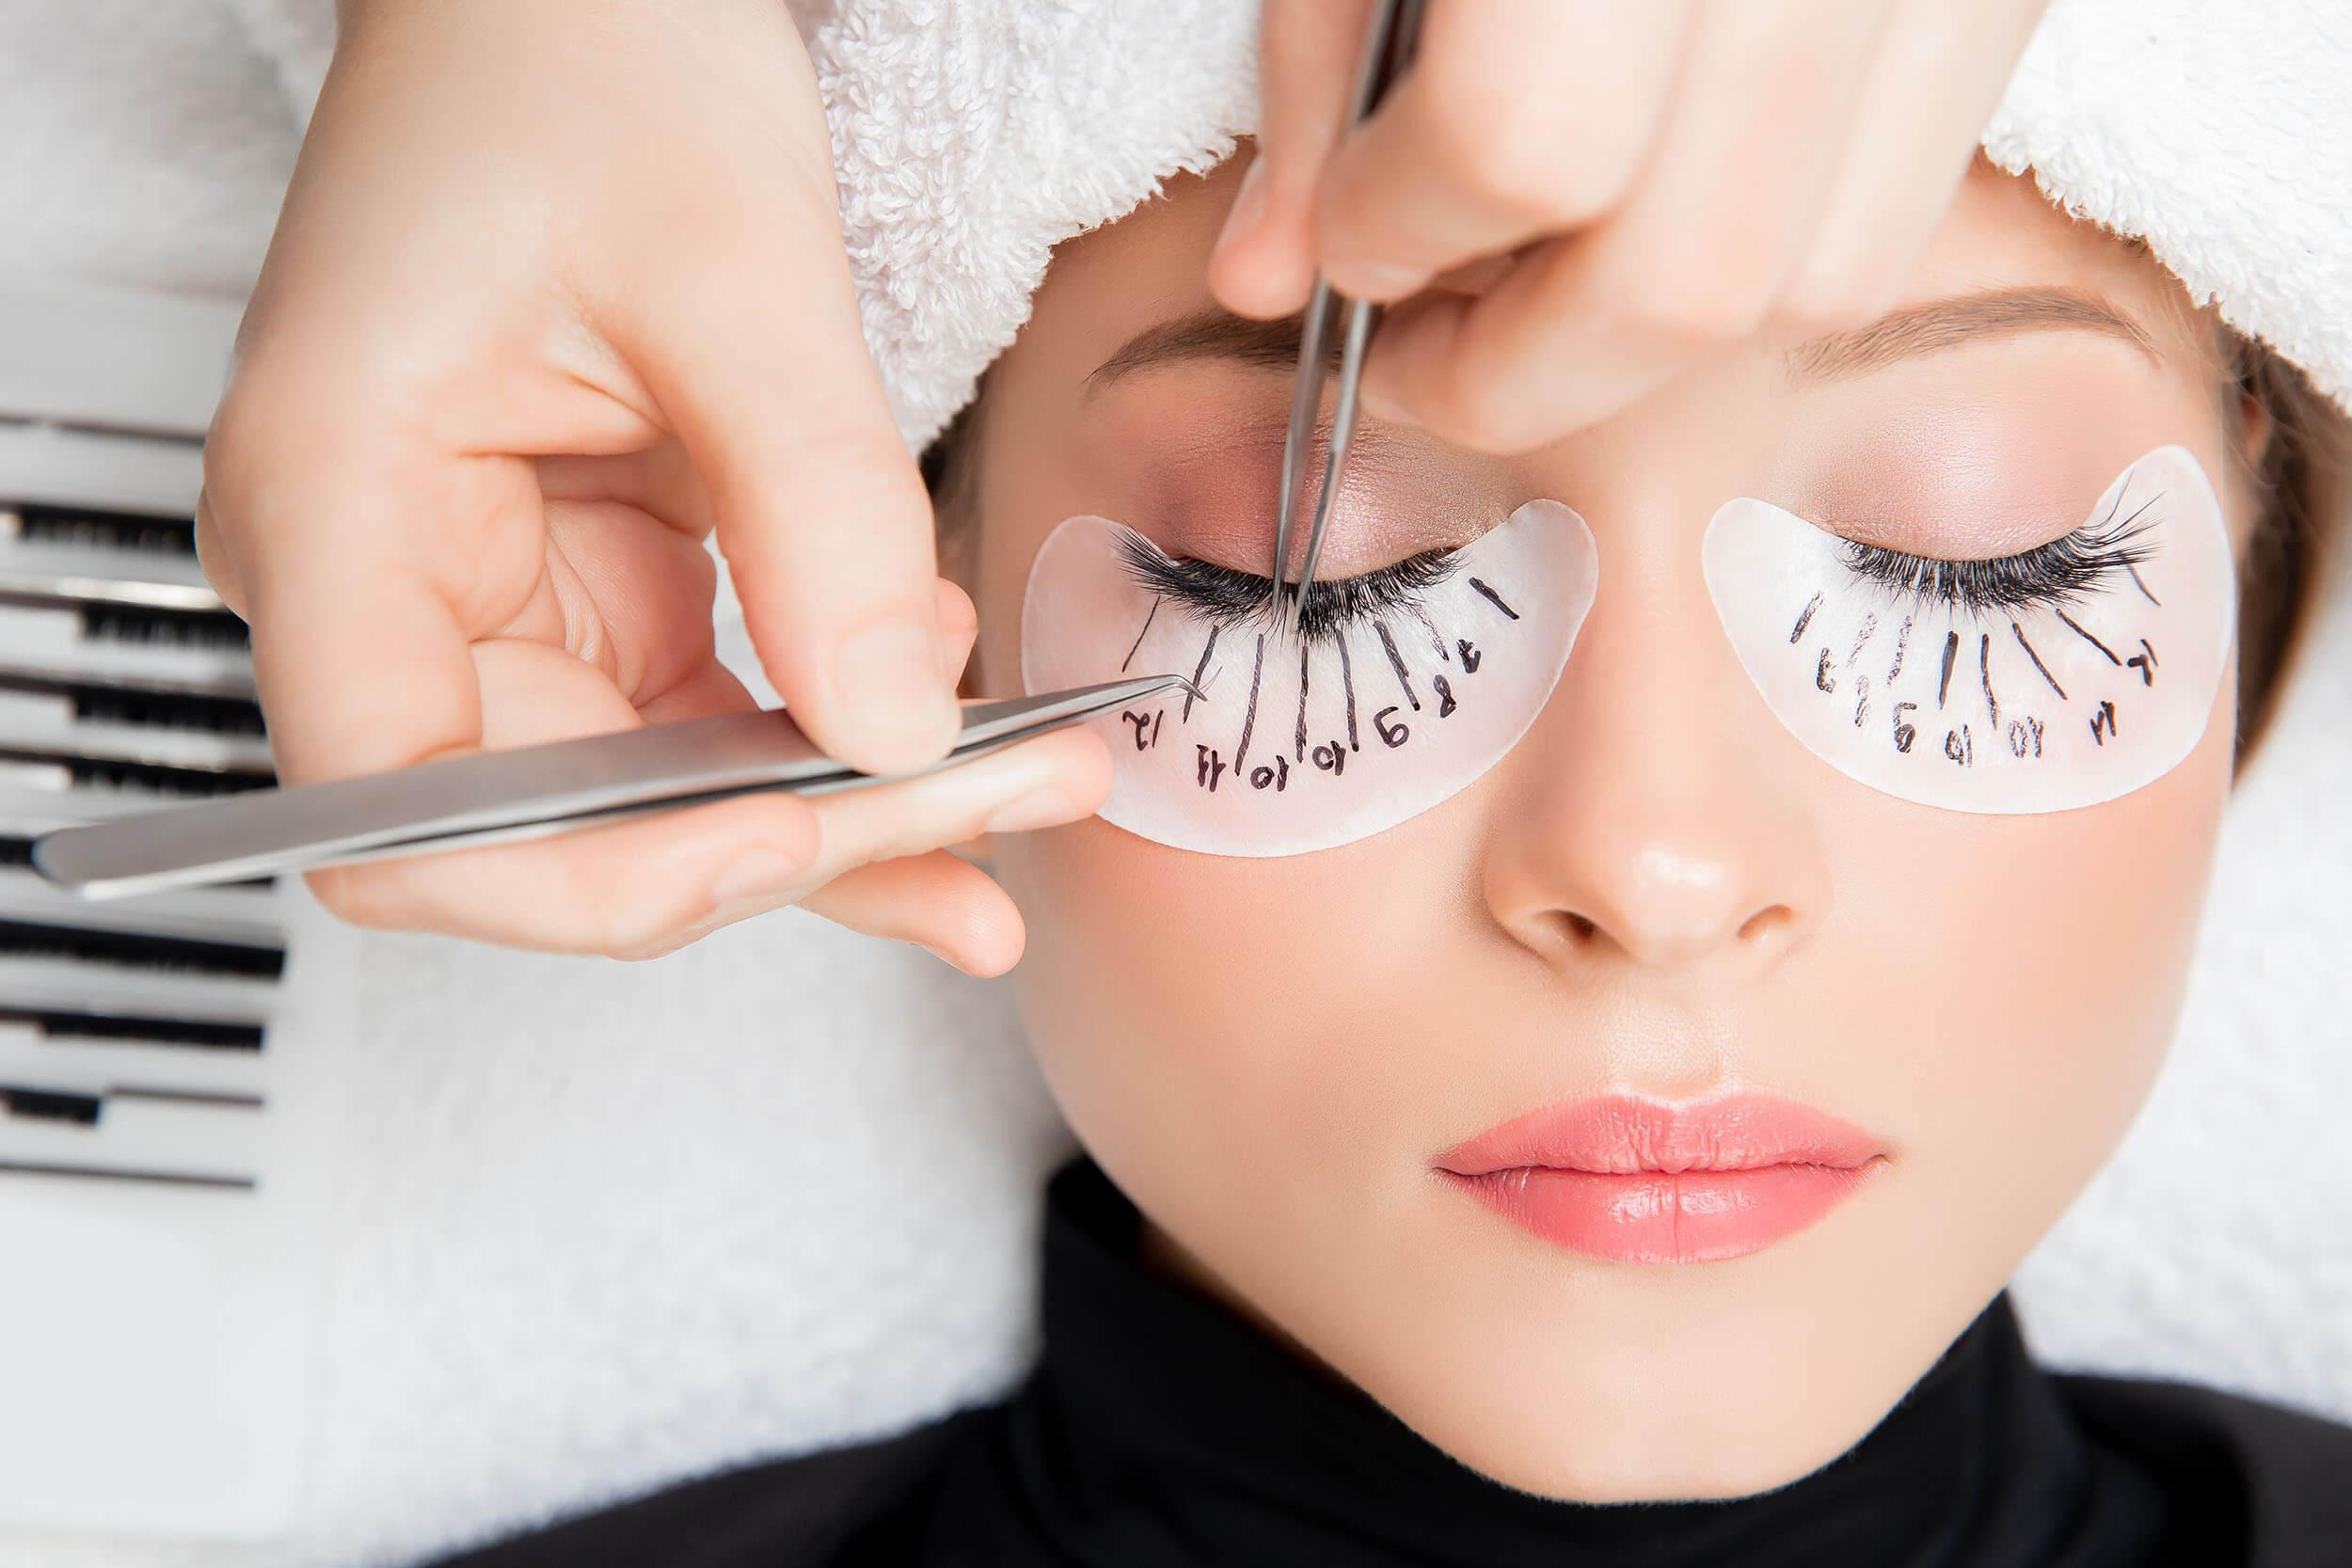 Best Eyelashes Extensions in Dehradun - customer showing her eyelashes